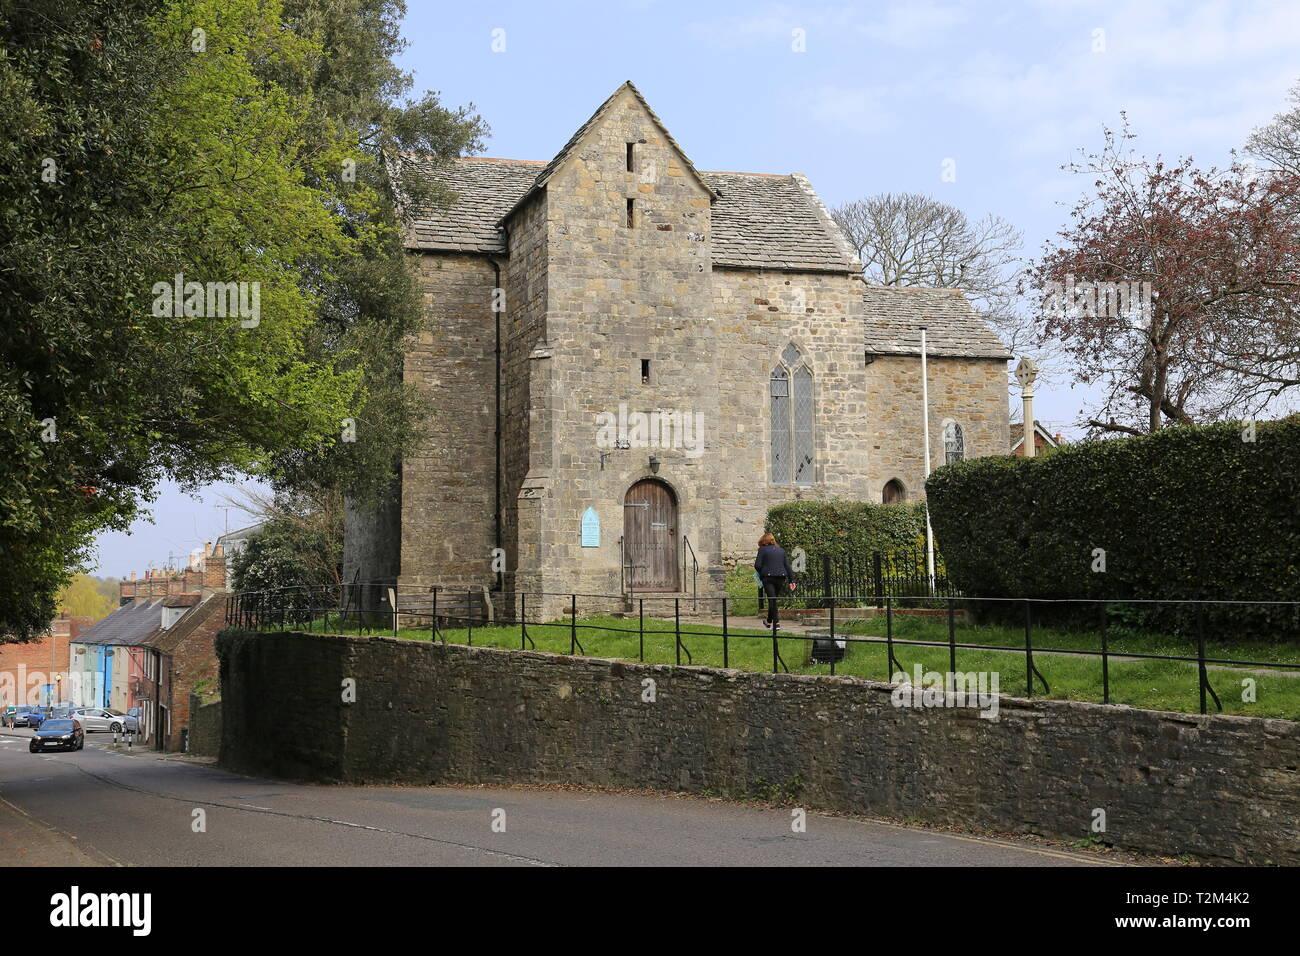 St Martin's (aka St Martin's-on-the-Walls) Anglo-Saxon church, Wareham, Isle of Purbeck, Dorset, England, Great Britain, United Kingdom, UK, Europe - Stock Image